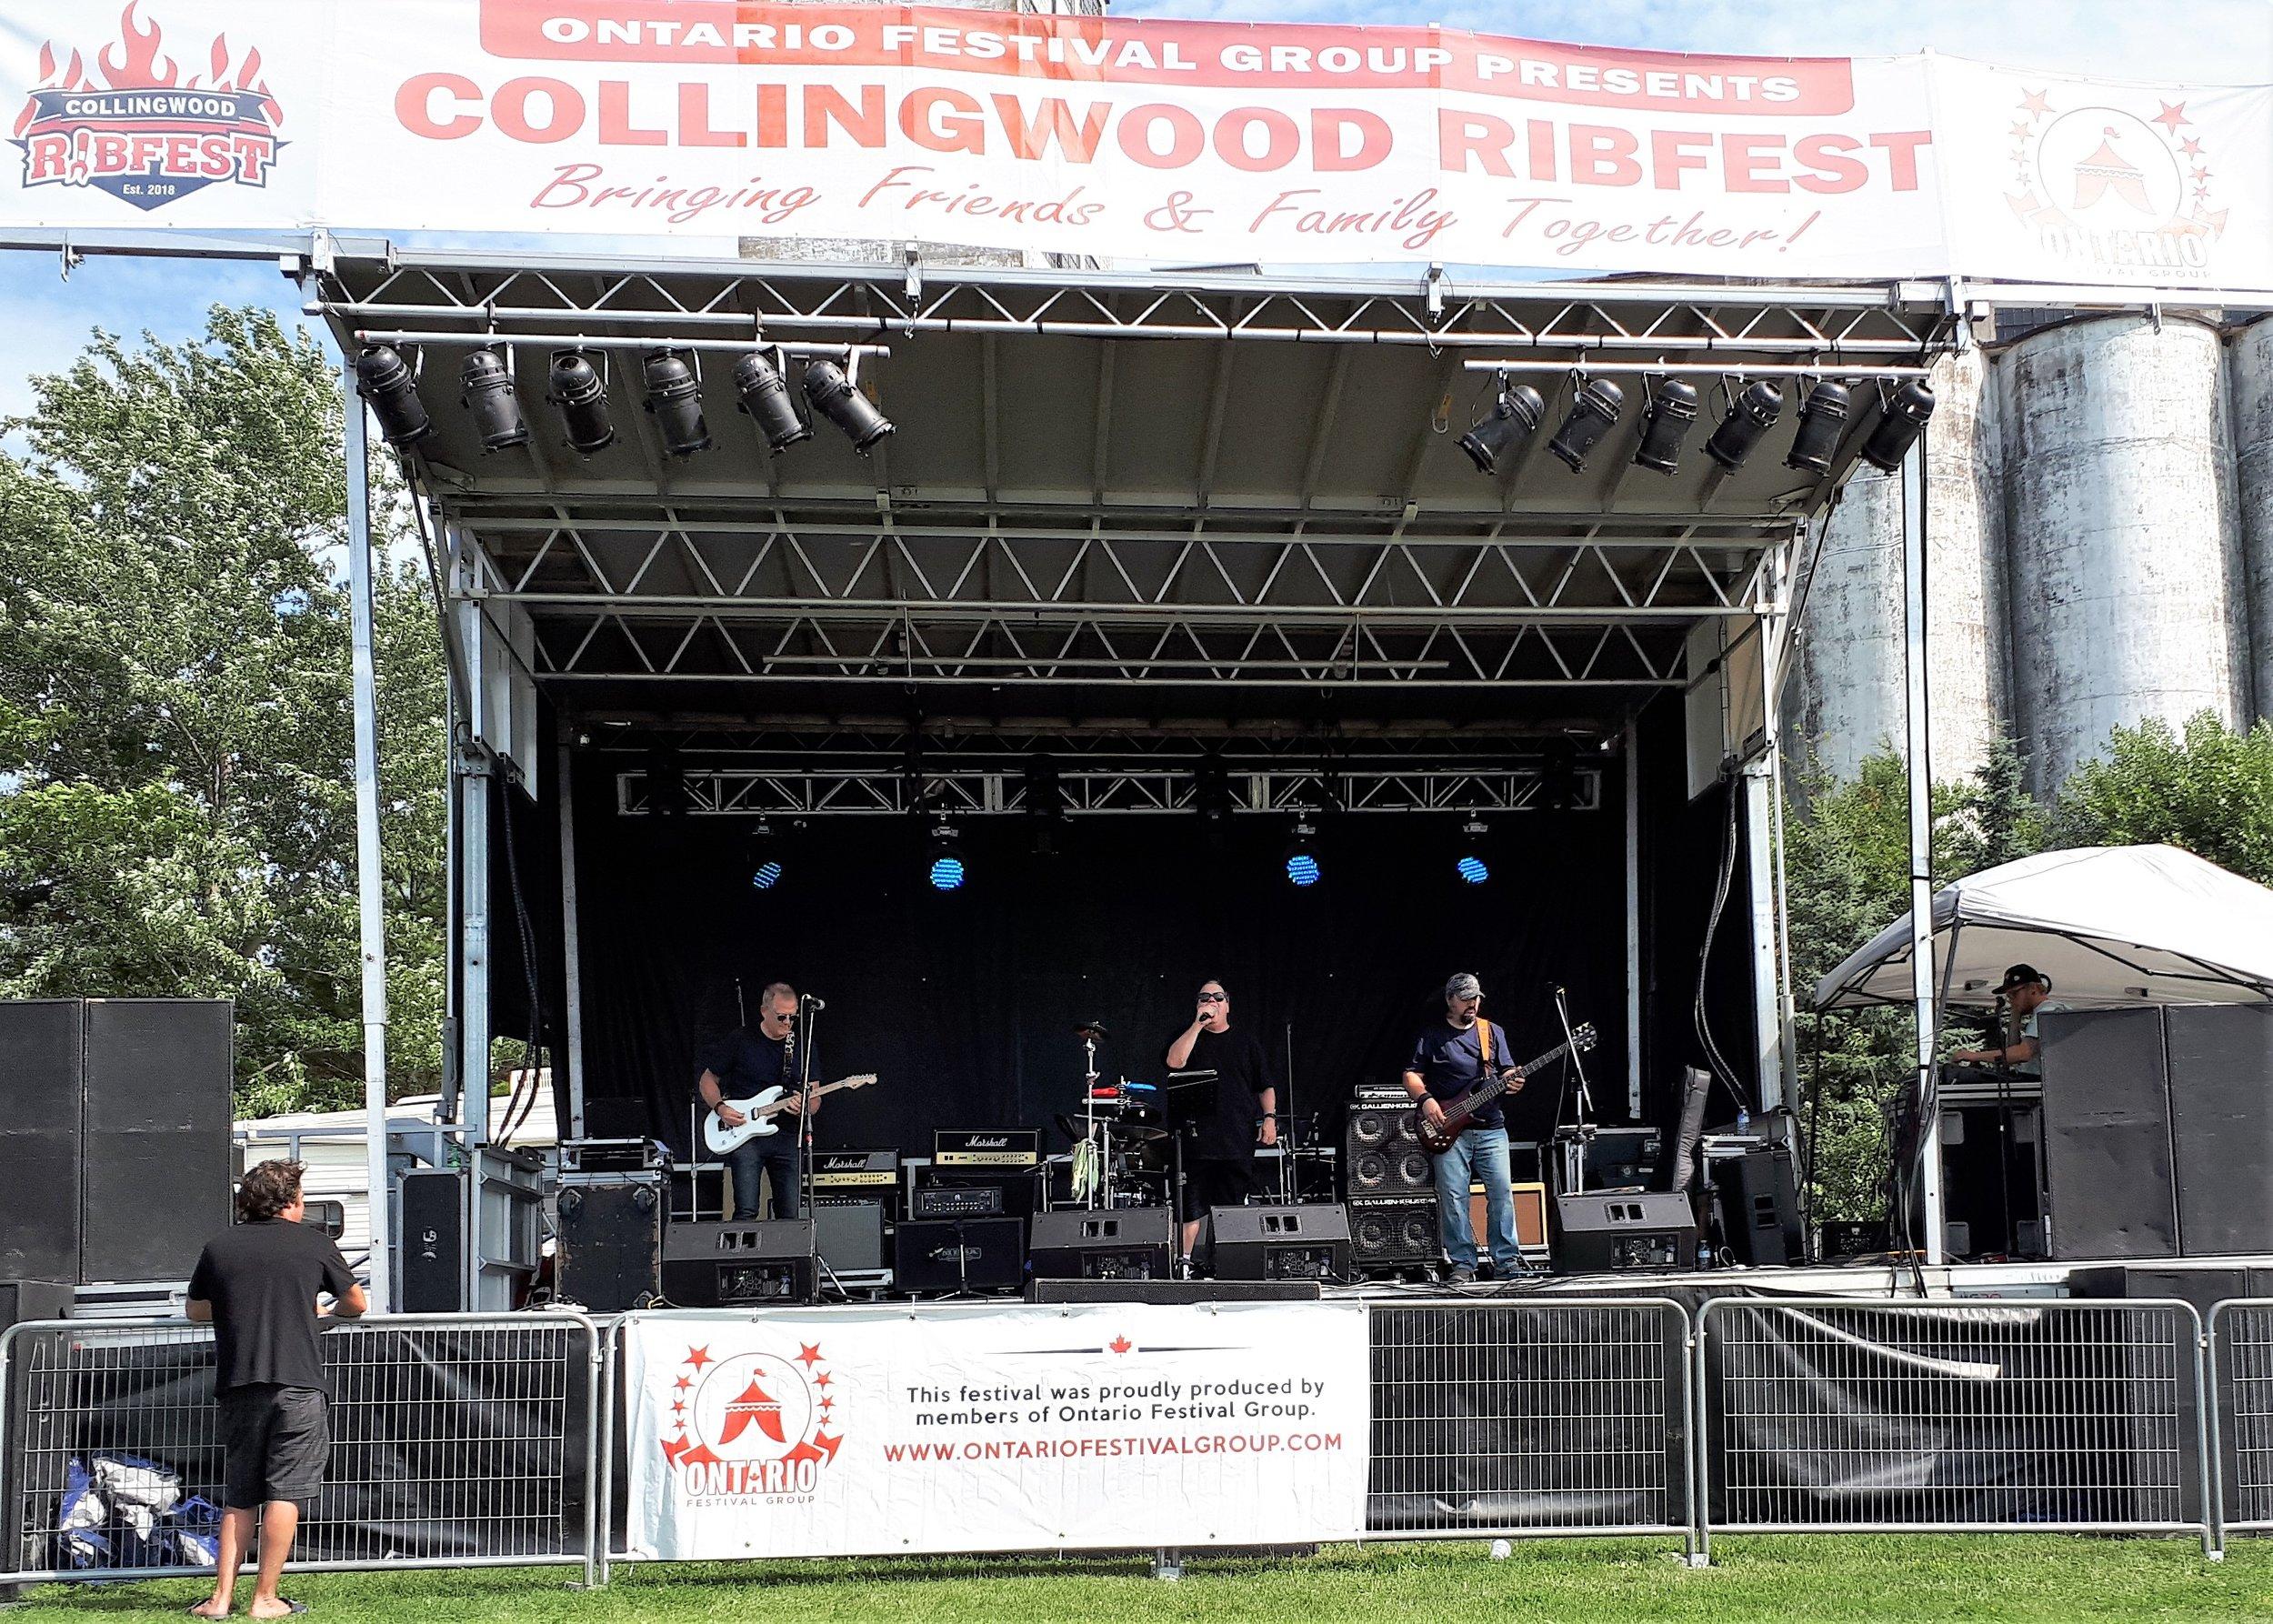 Collingwood Ribfest 2018